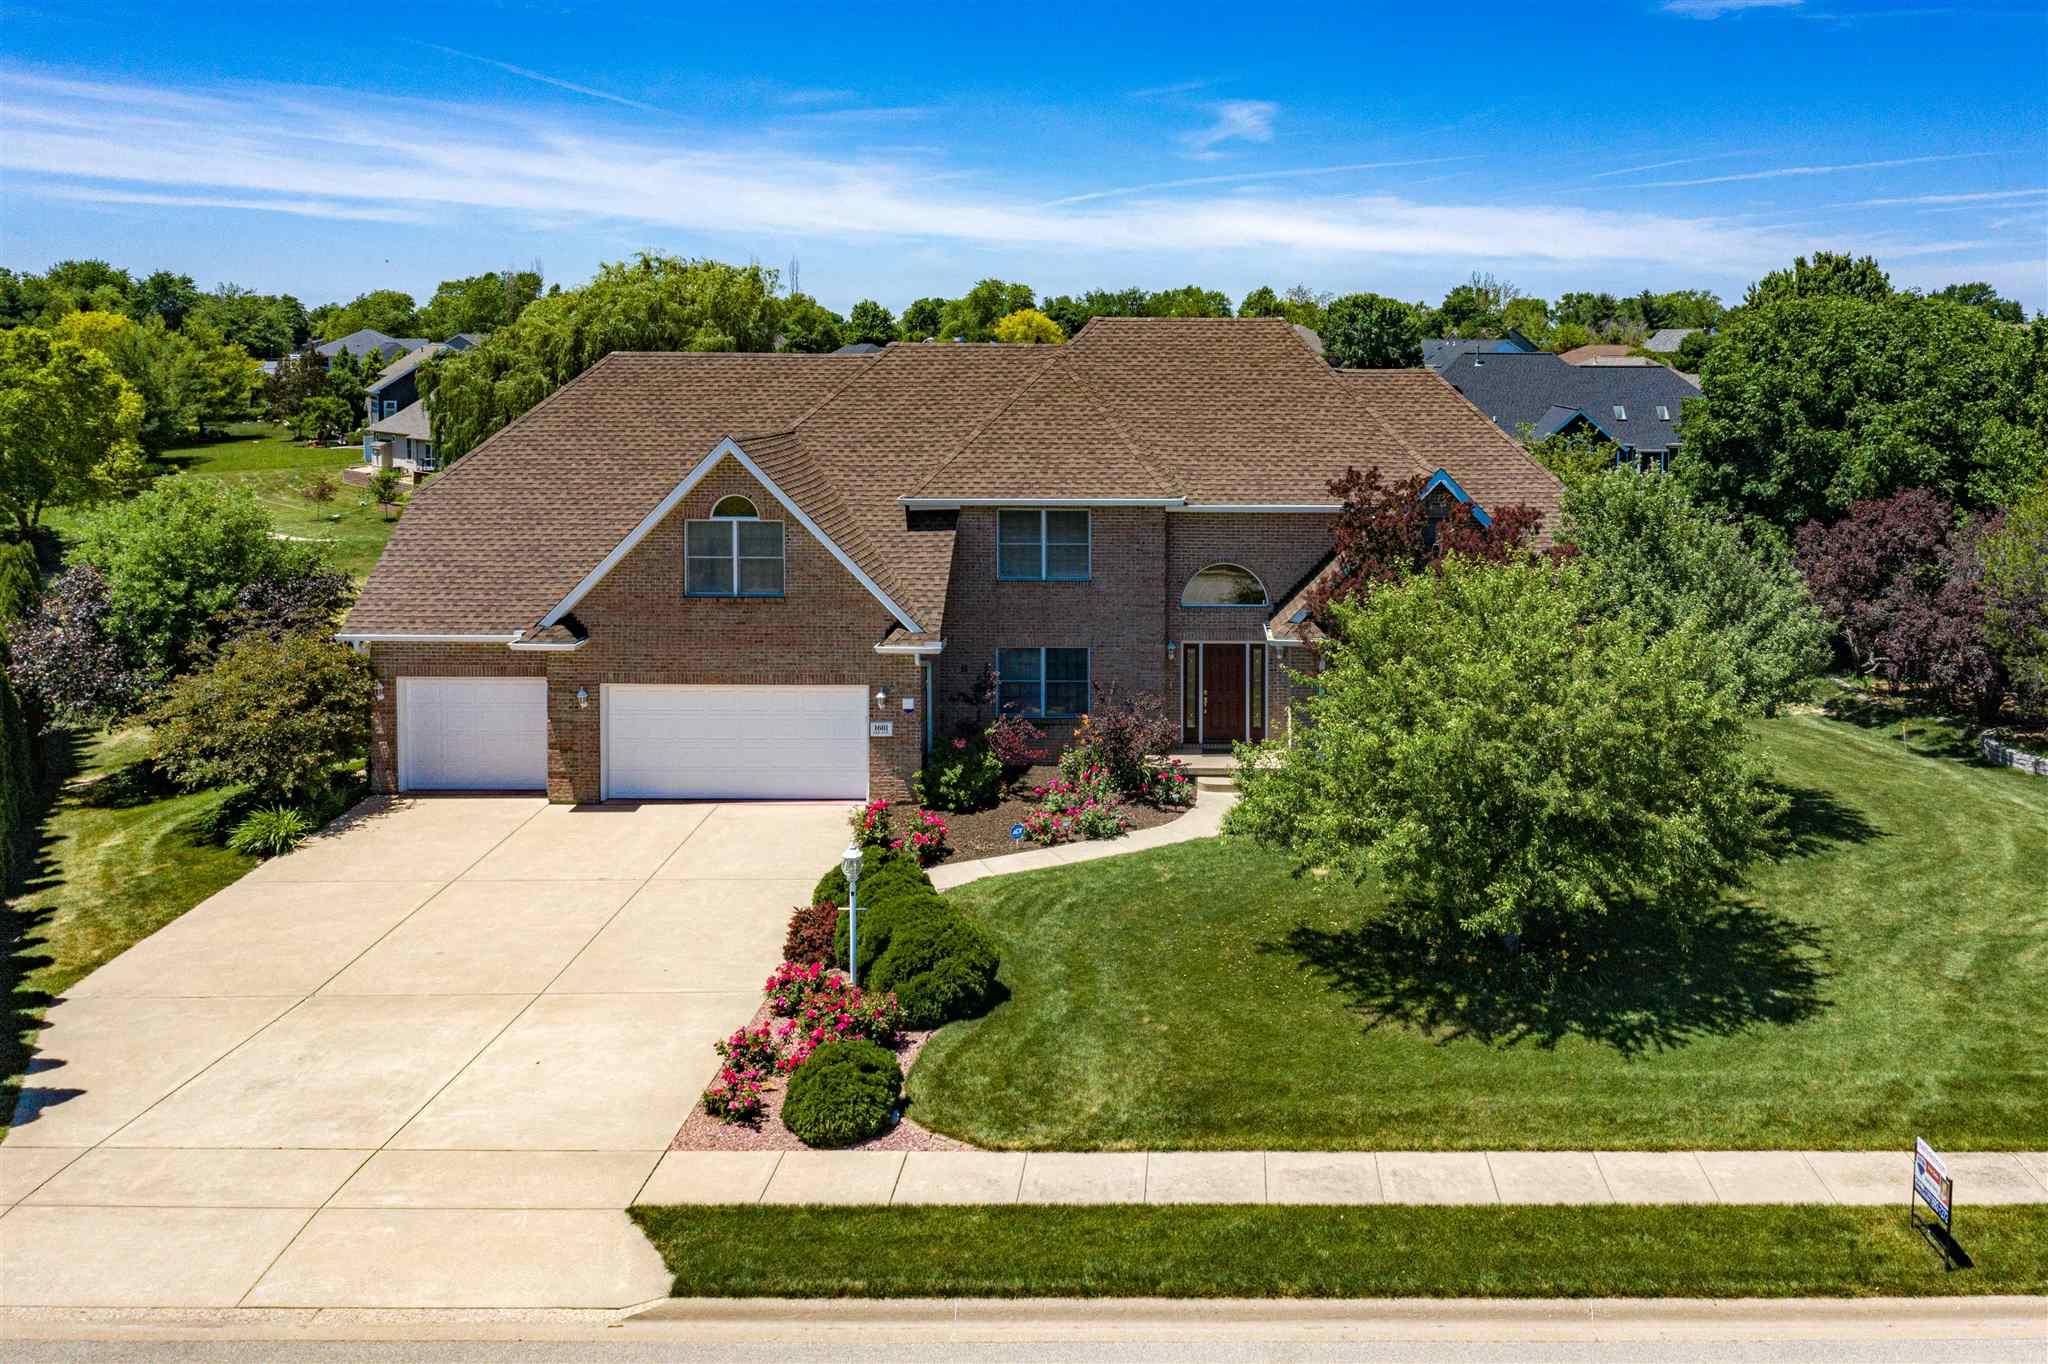 1601 S LEE Property Photo - Morton, IL real estate listing